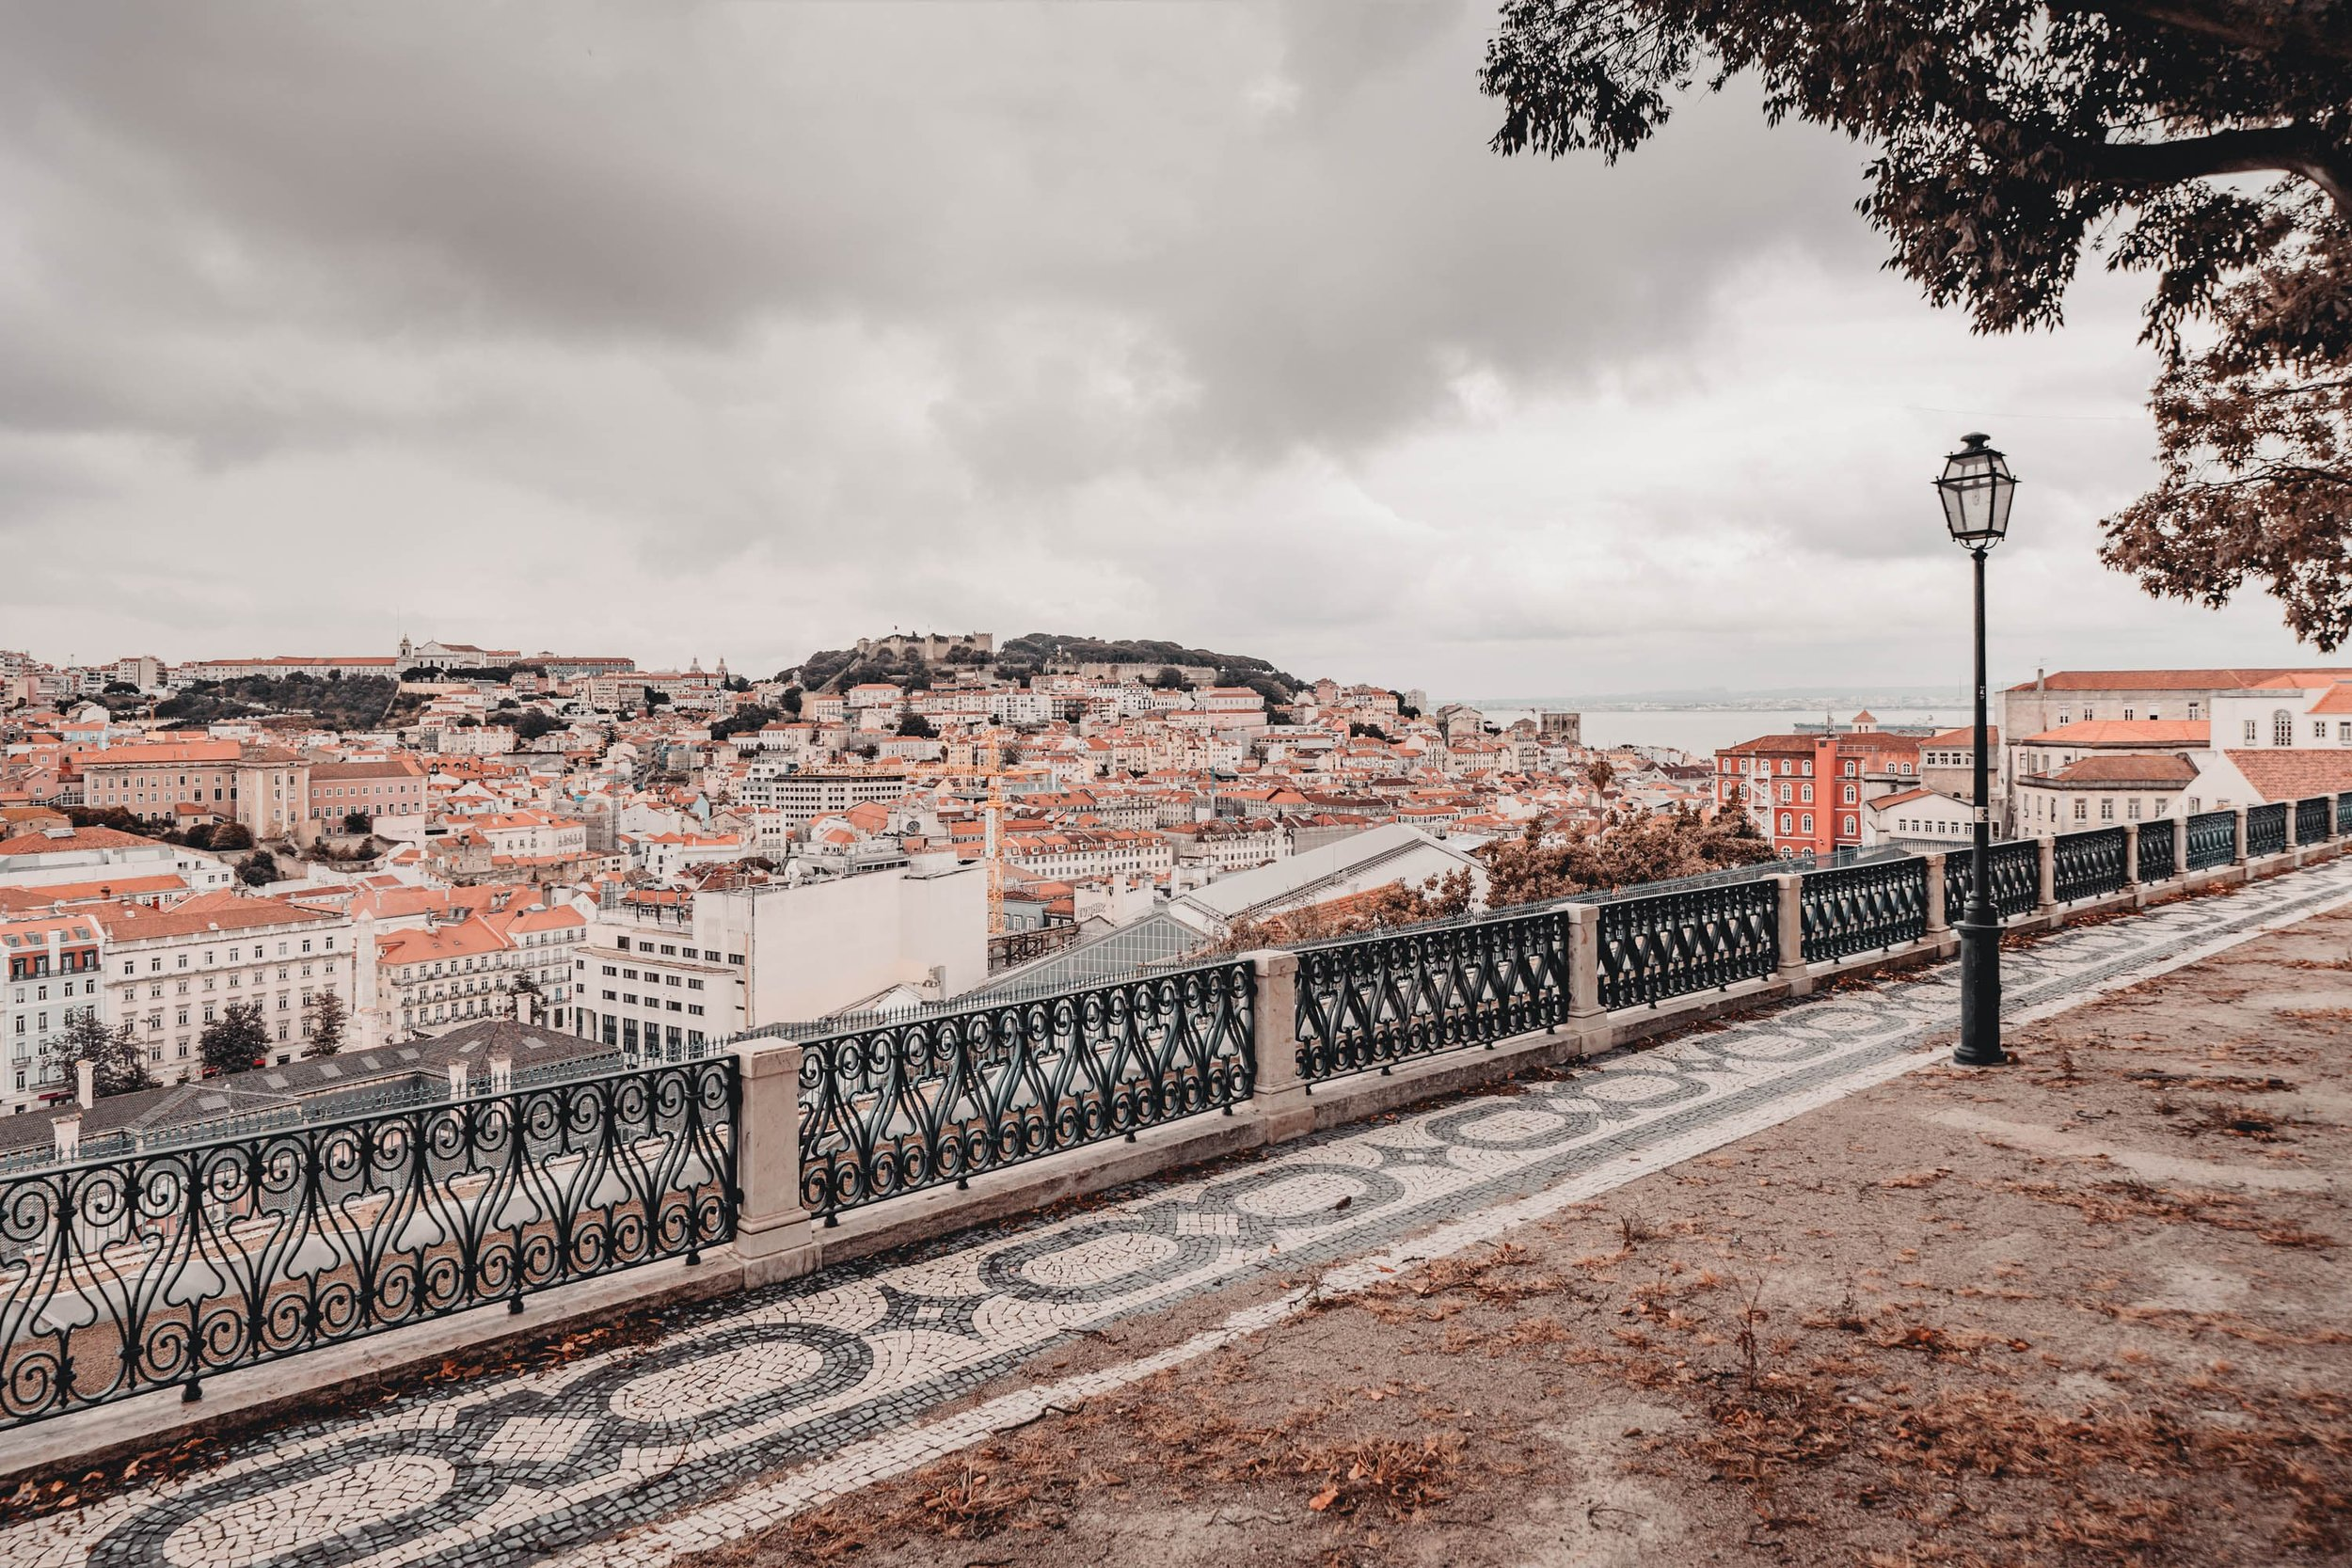 Maximilian_Otto_Portugal-Journal_08.jpg